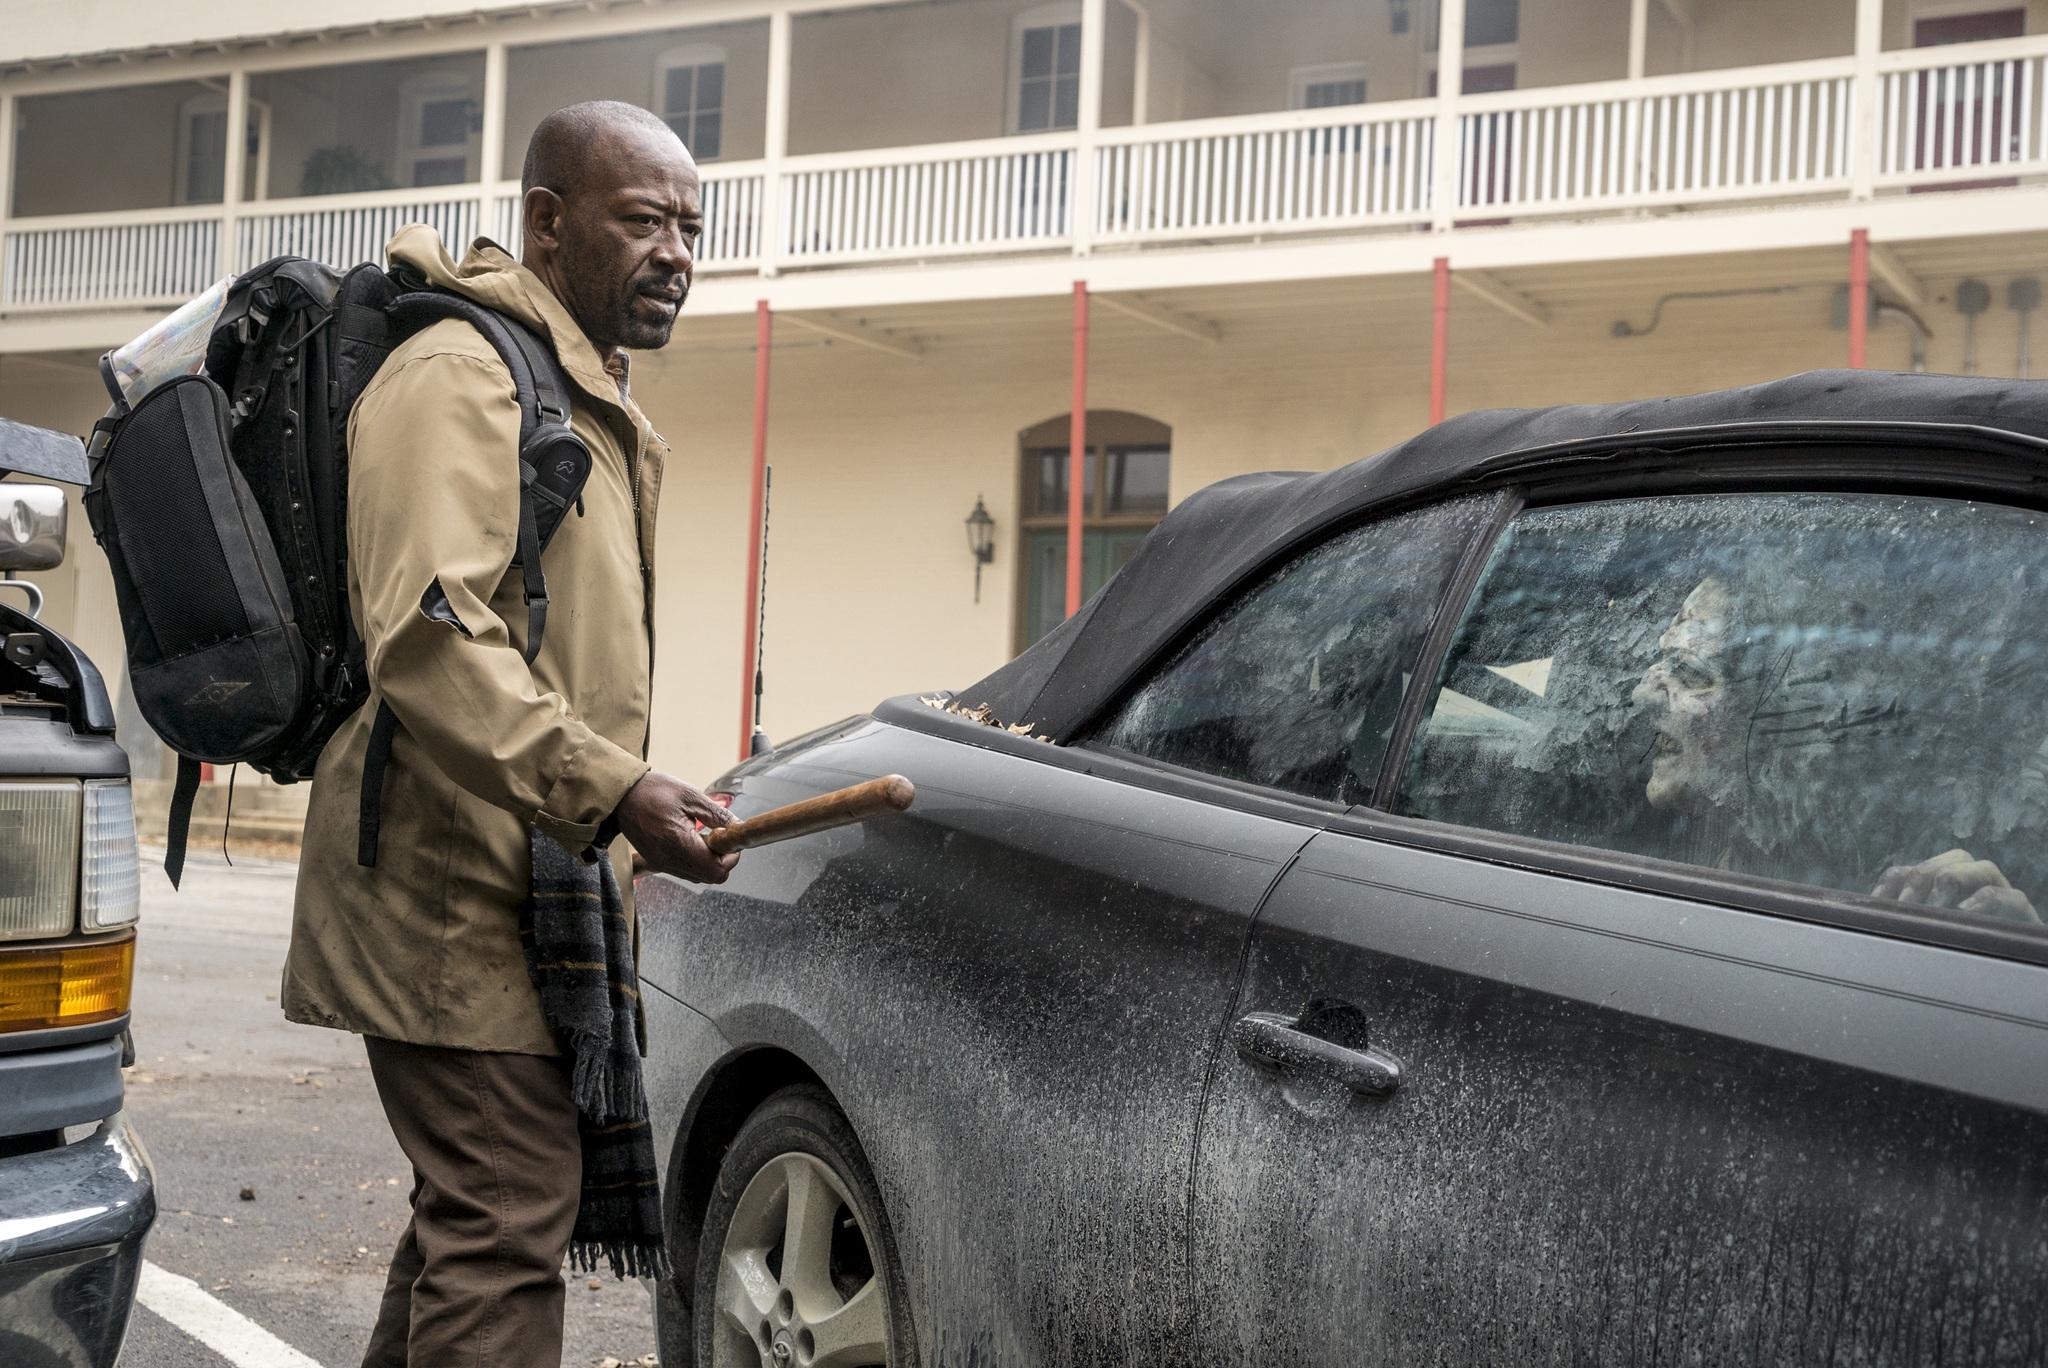 Fear the Walking Dead: What's Your Story? | Season 4 | Episode 1